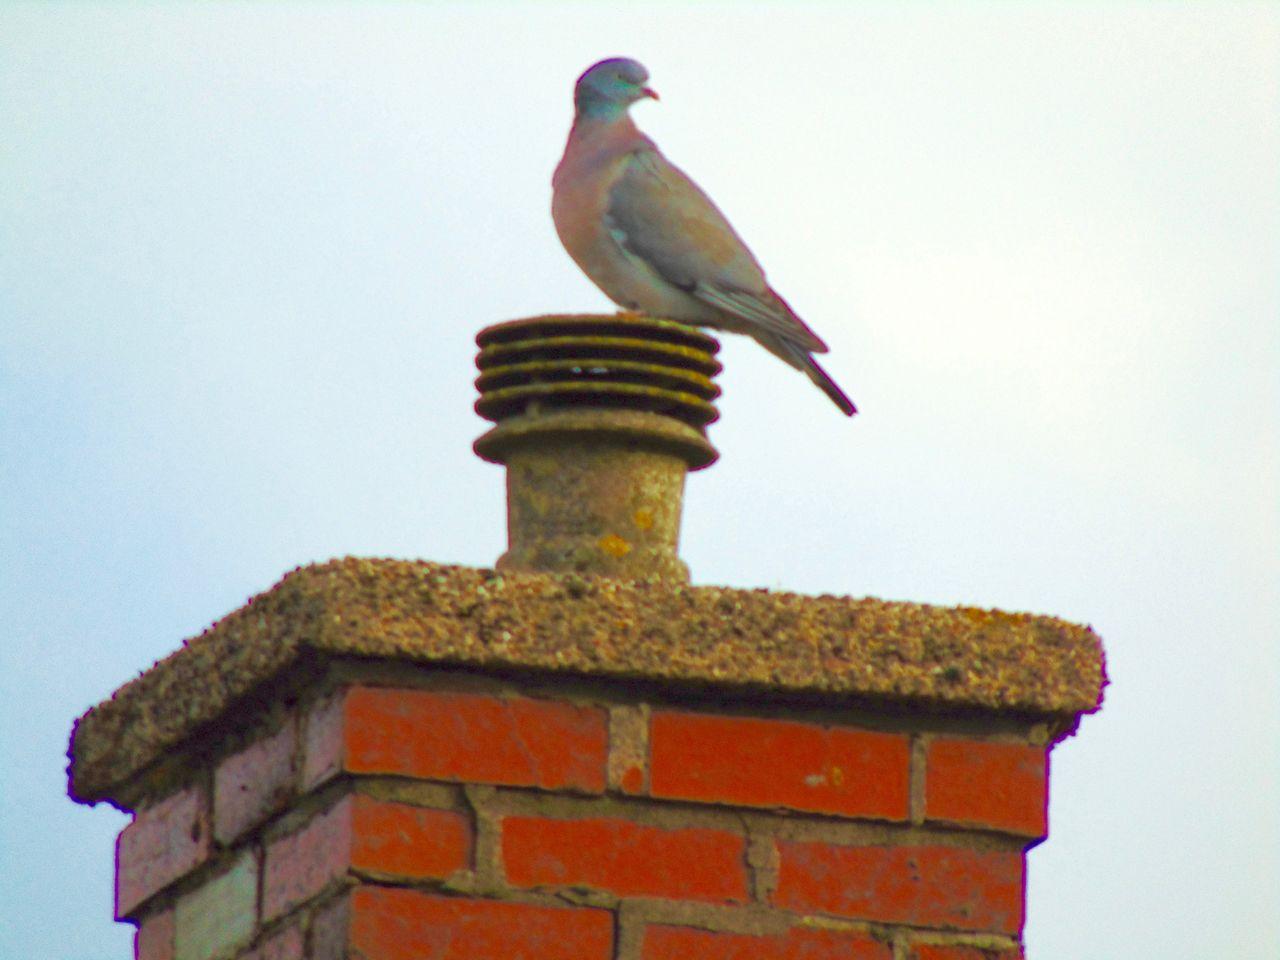 Bird Bird Photography Chimney Chimney Tops Close Up Close-up Dusk Dusk Sky Outdoors Sky Wildlife Wood Pigeon